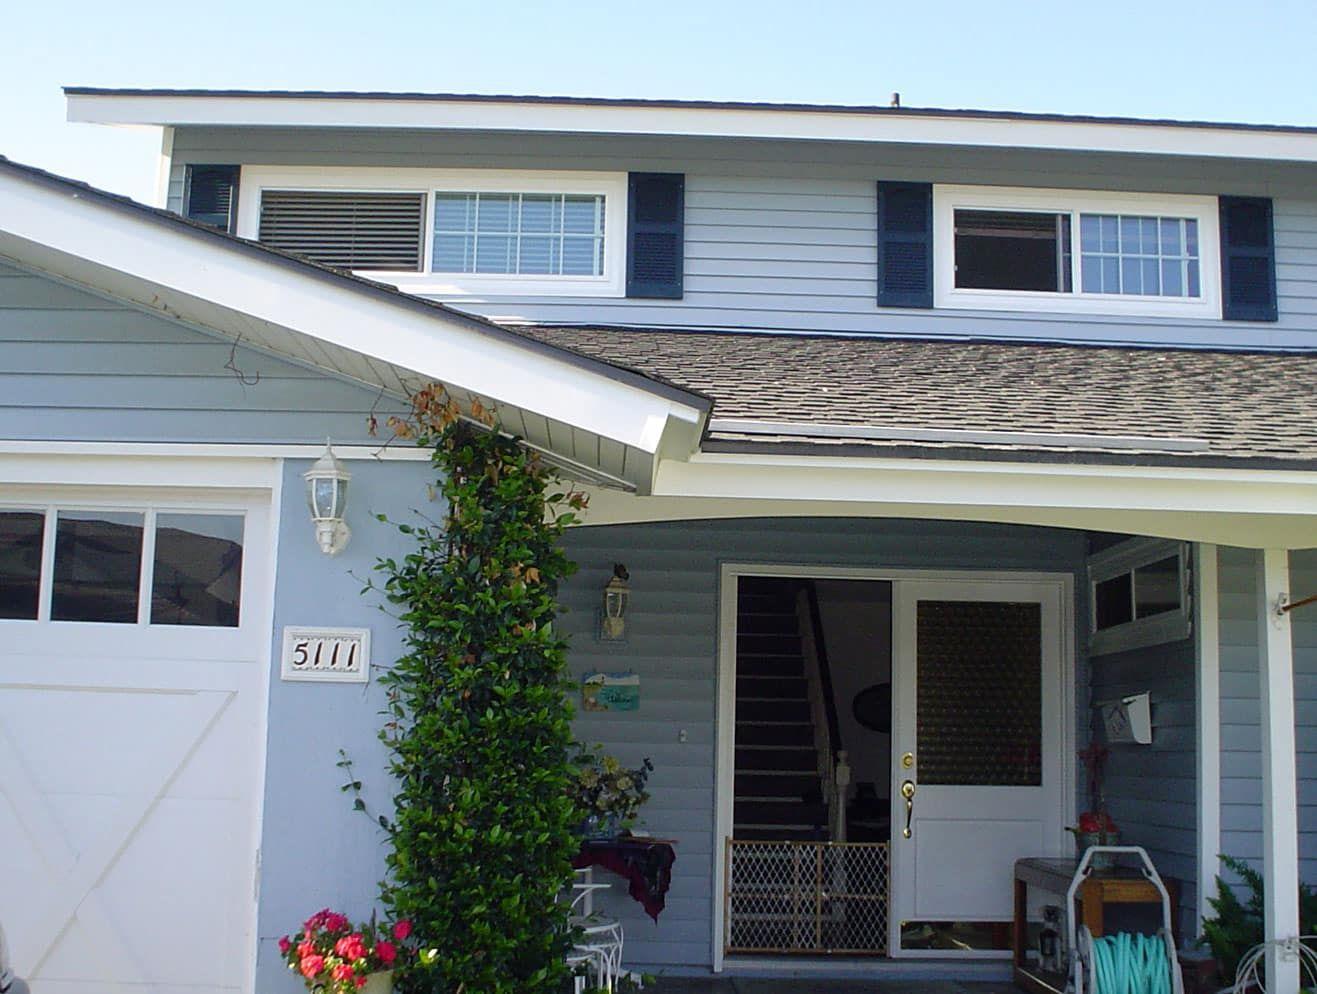 125 Cat Exteriors Inc Sacramento Calif Replacement Home Improvement Contractor Home Improvement Contractors Exterior Residential Remodel